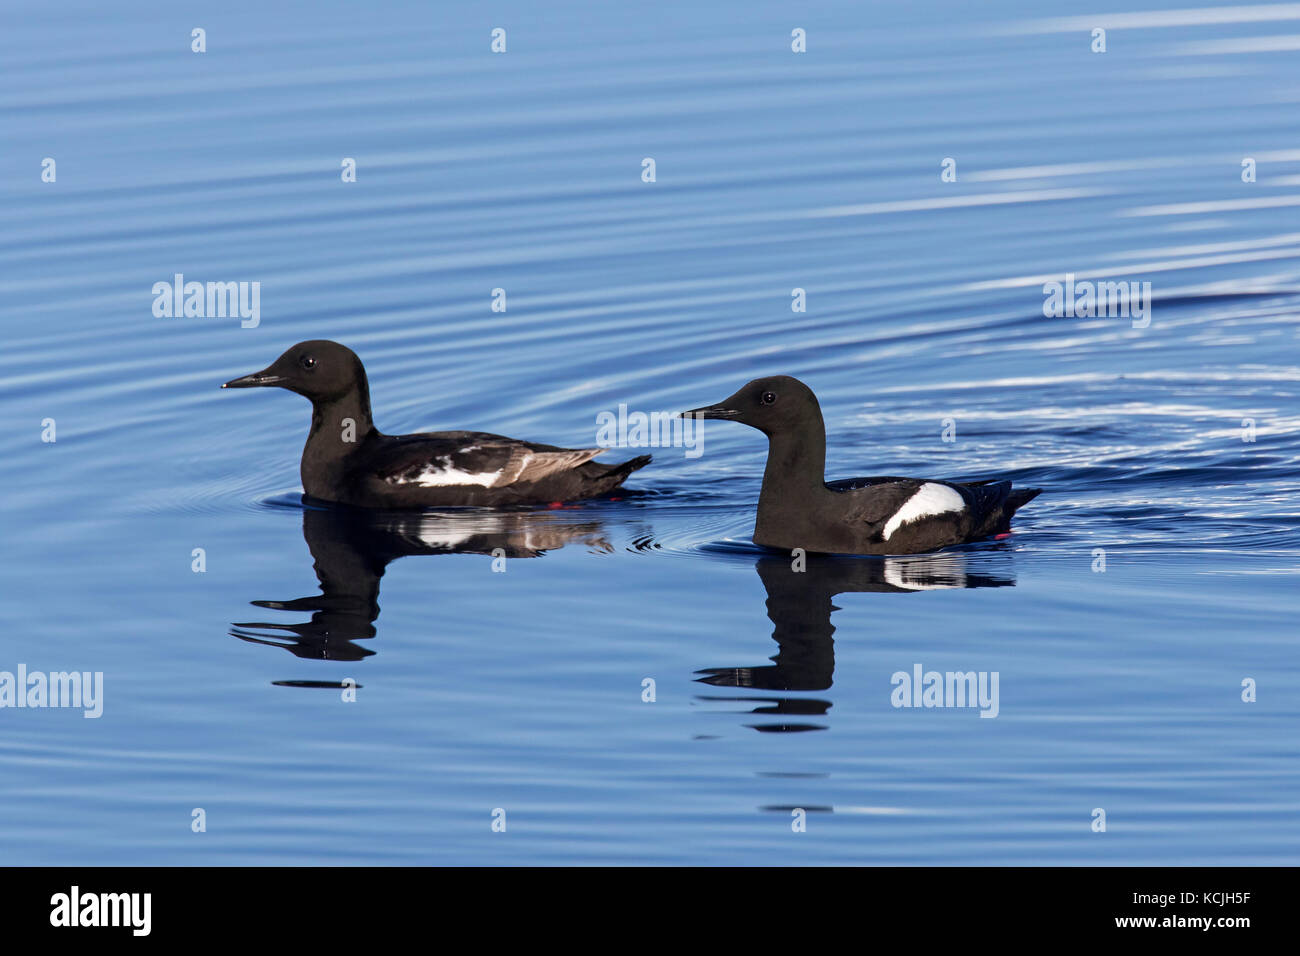 Two black guillemots / tysties (Cepphus grylle) in breeding plumage swimming in sea Stock Photo